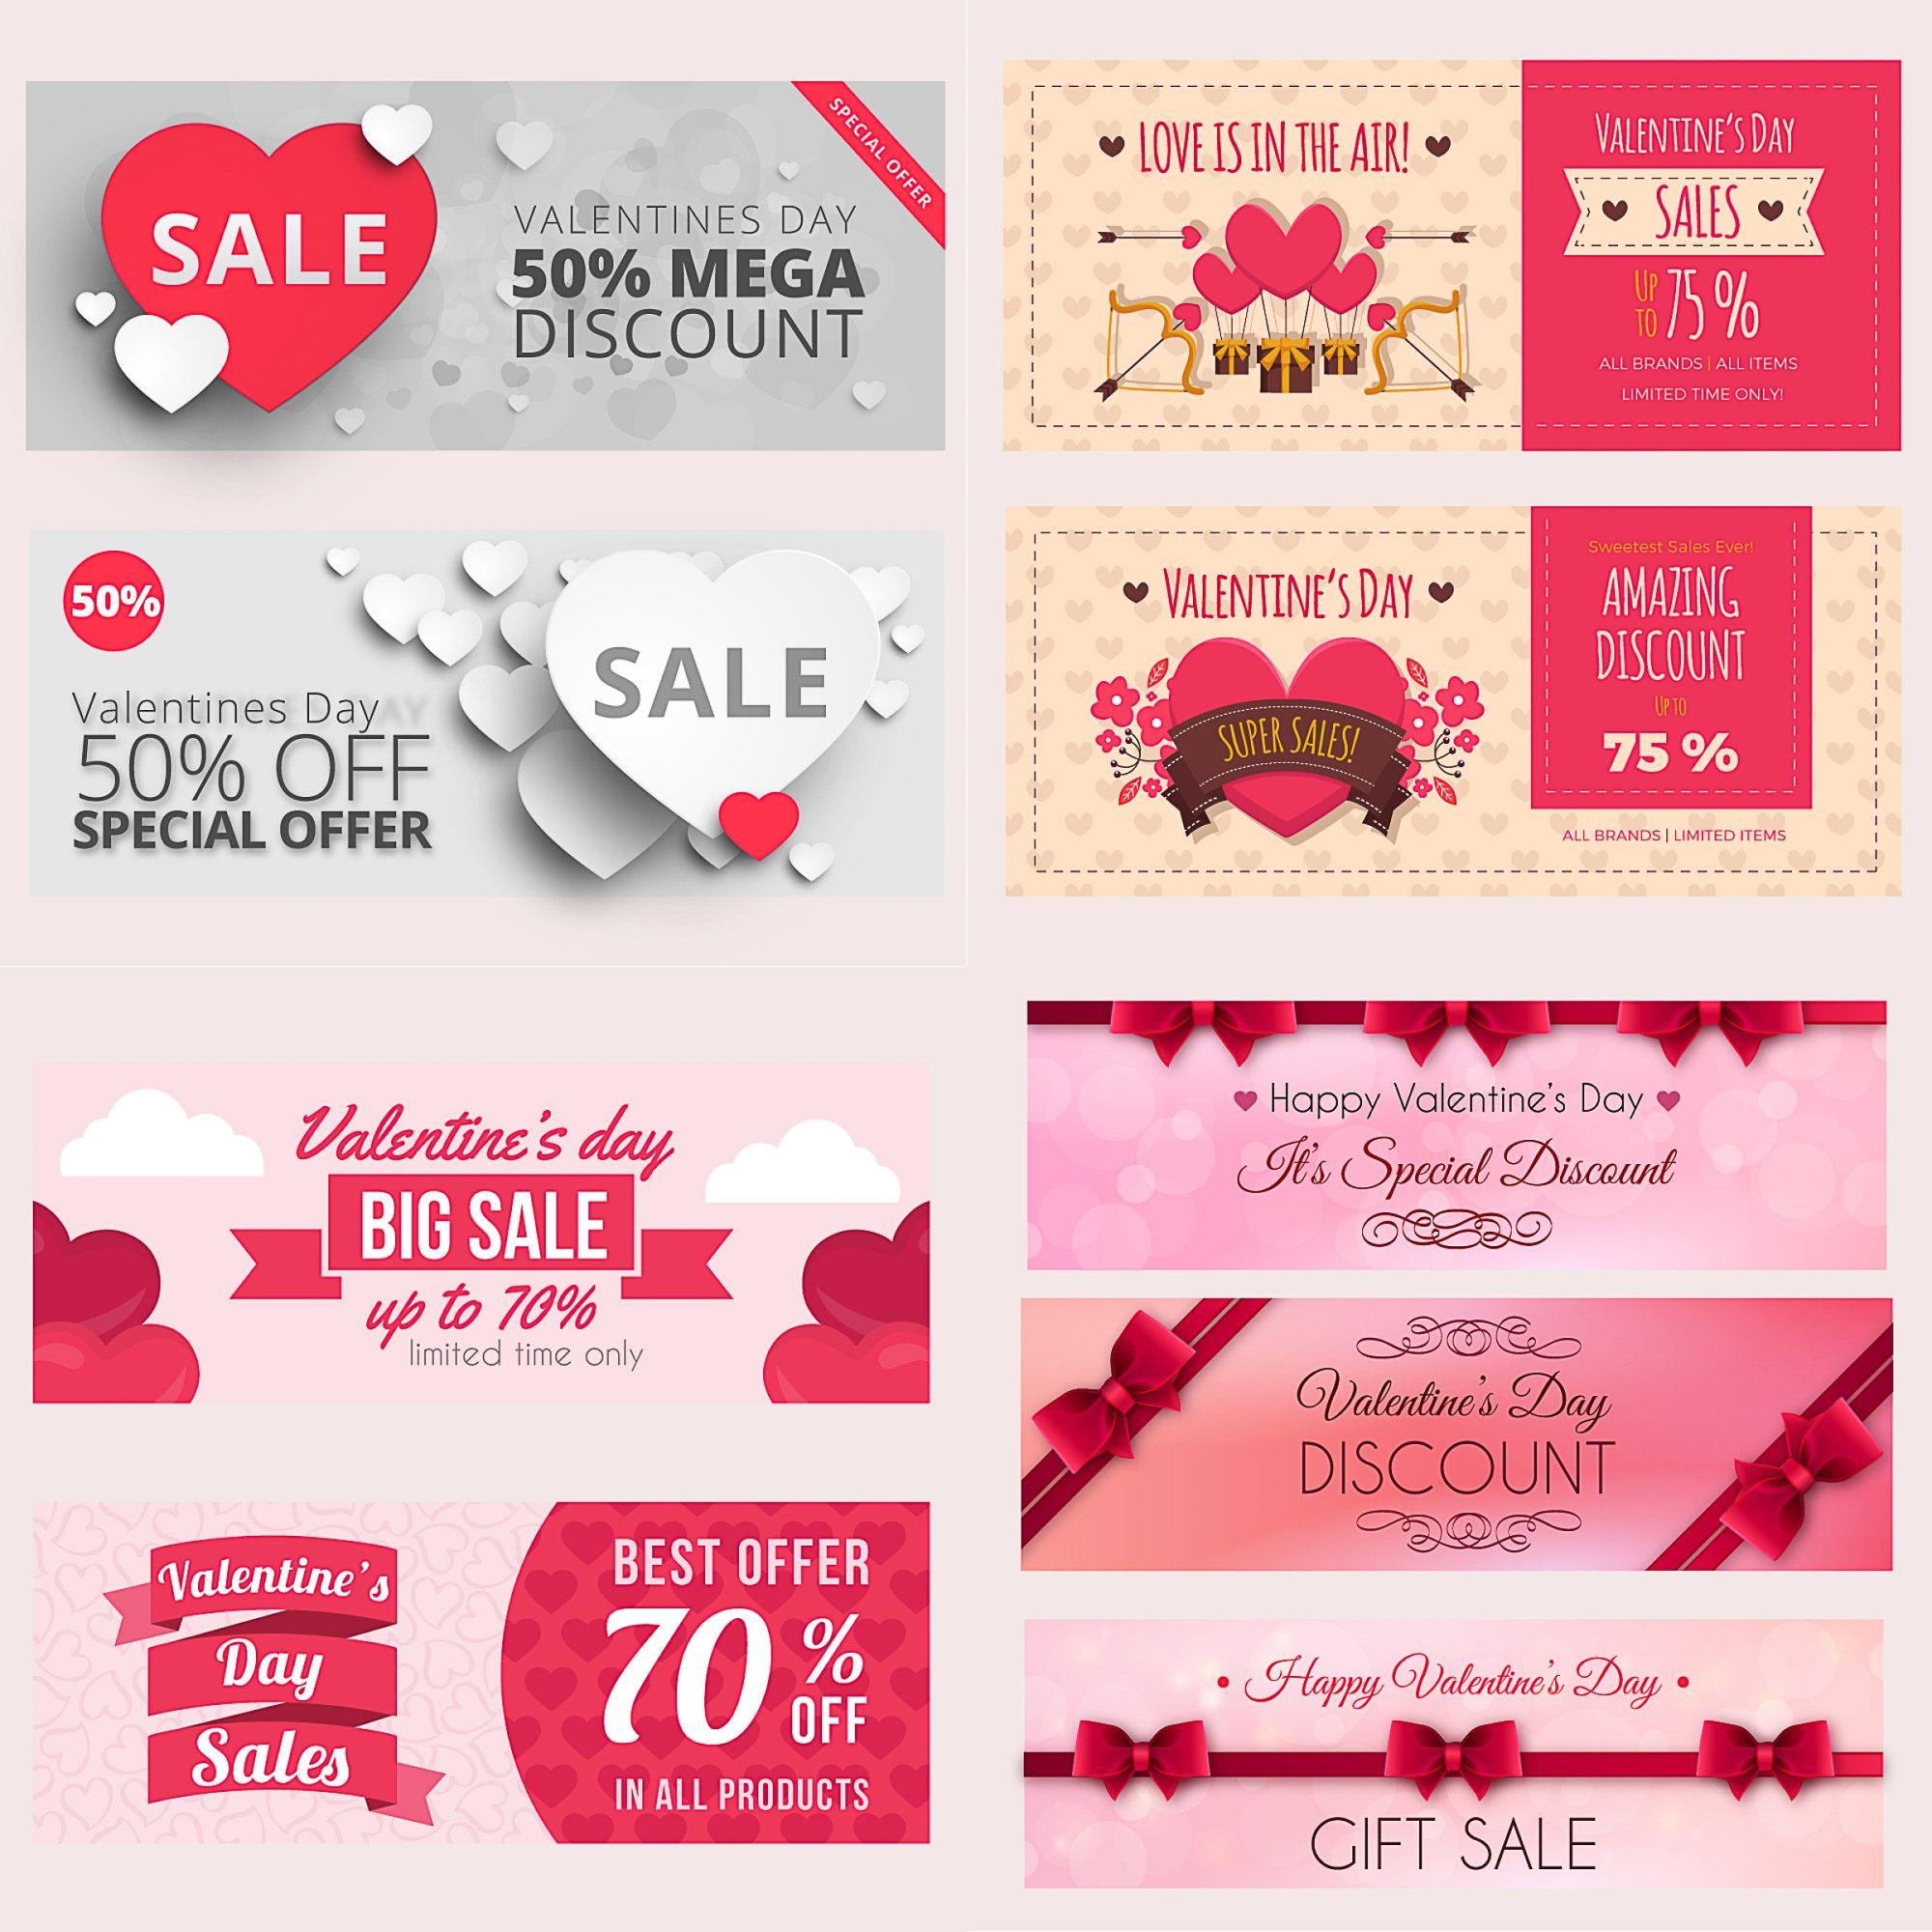 Design banner free download - Sale Web Header Or Banner For Valentine S Day Free Download Ai